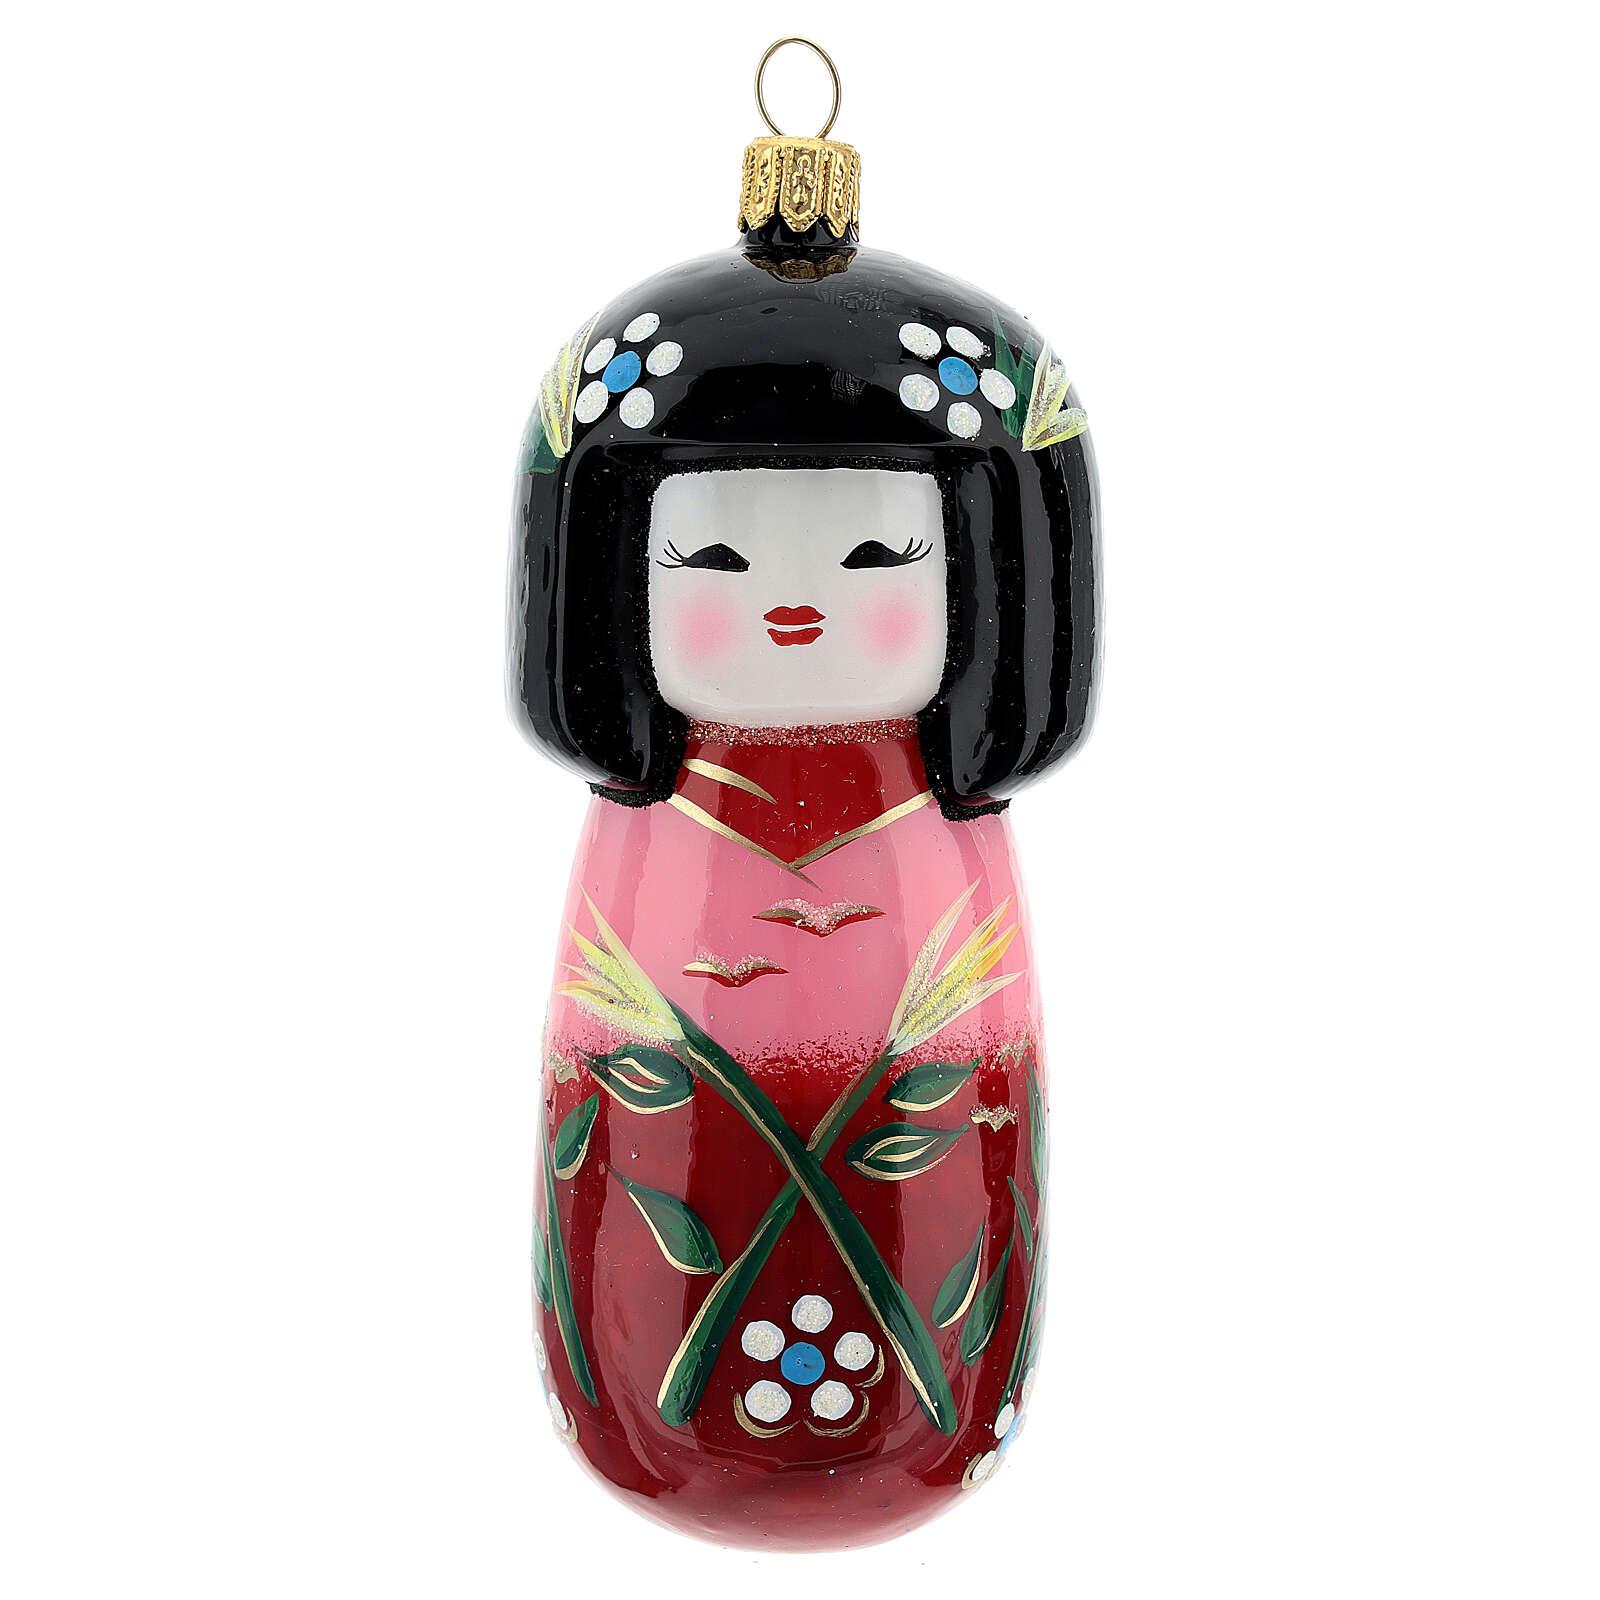 Muñeca Kokeshi japonesa vidrio soplado árbol Navidad 4